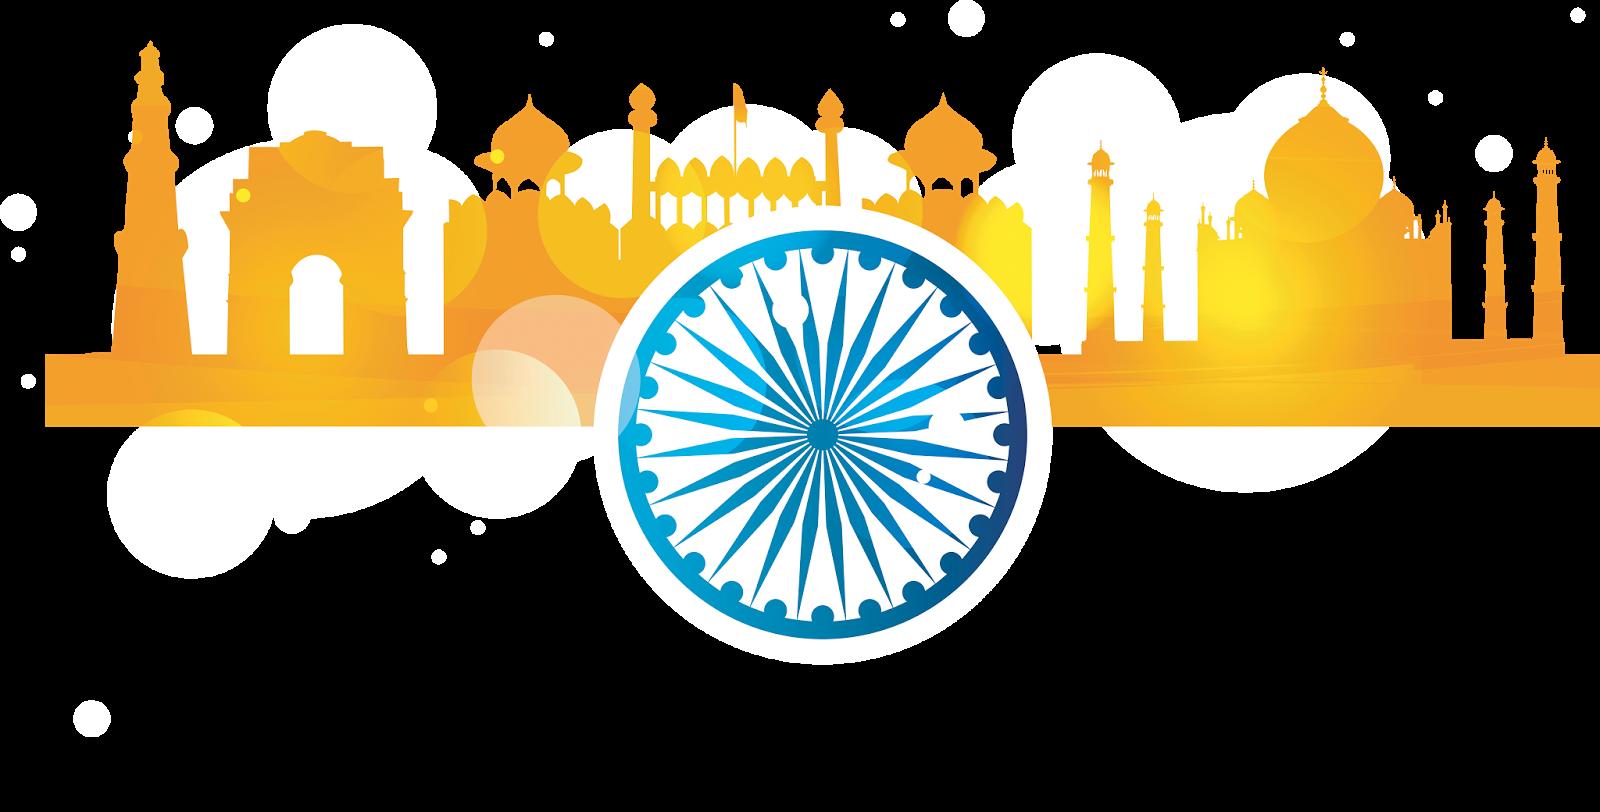 1600x812 15 Constitution Vector Indian For Free Download On Mbtskoudsalg